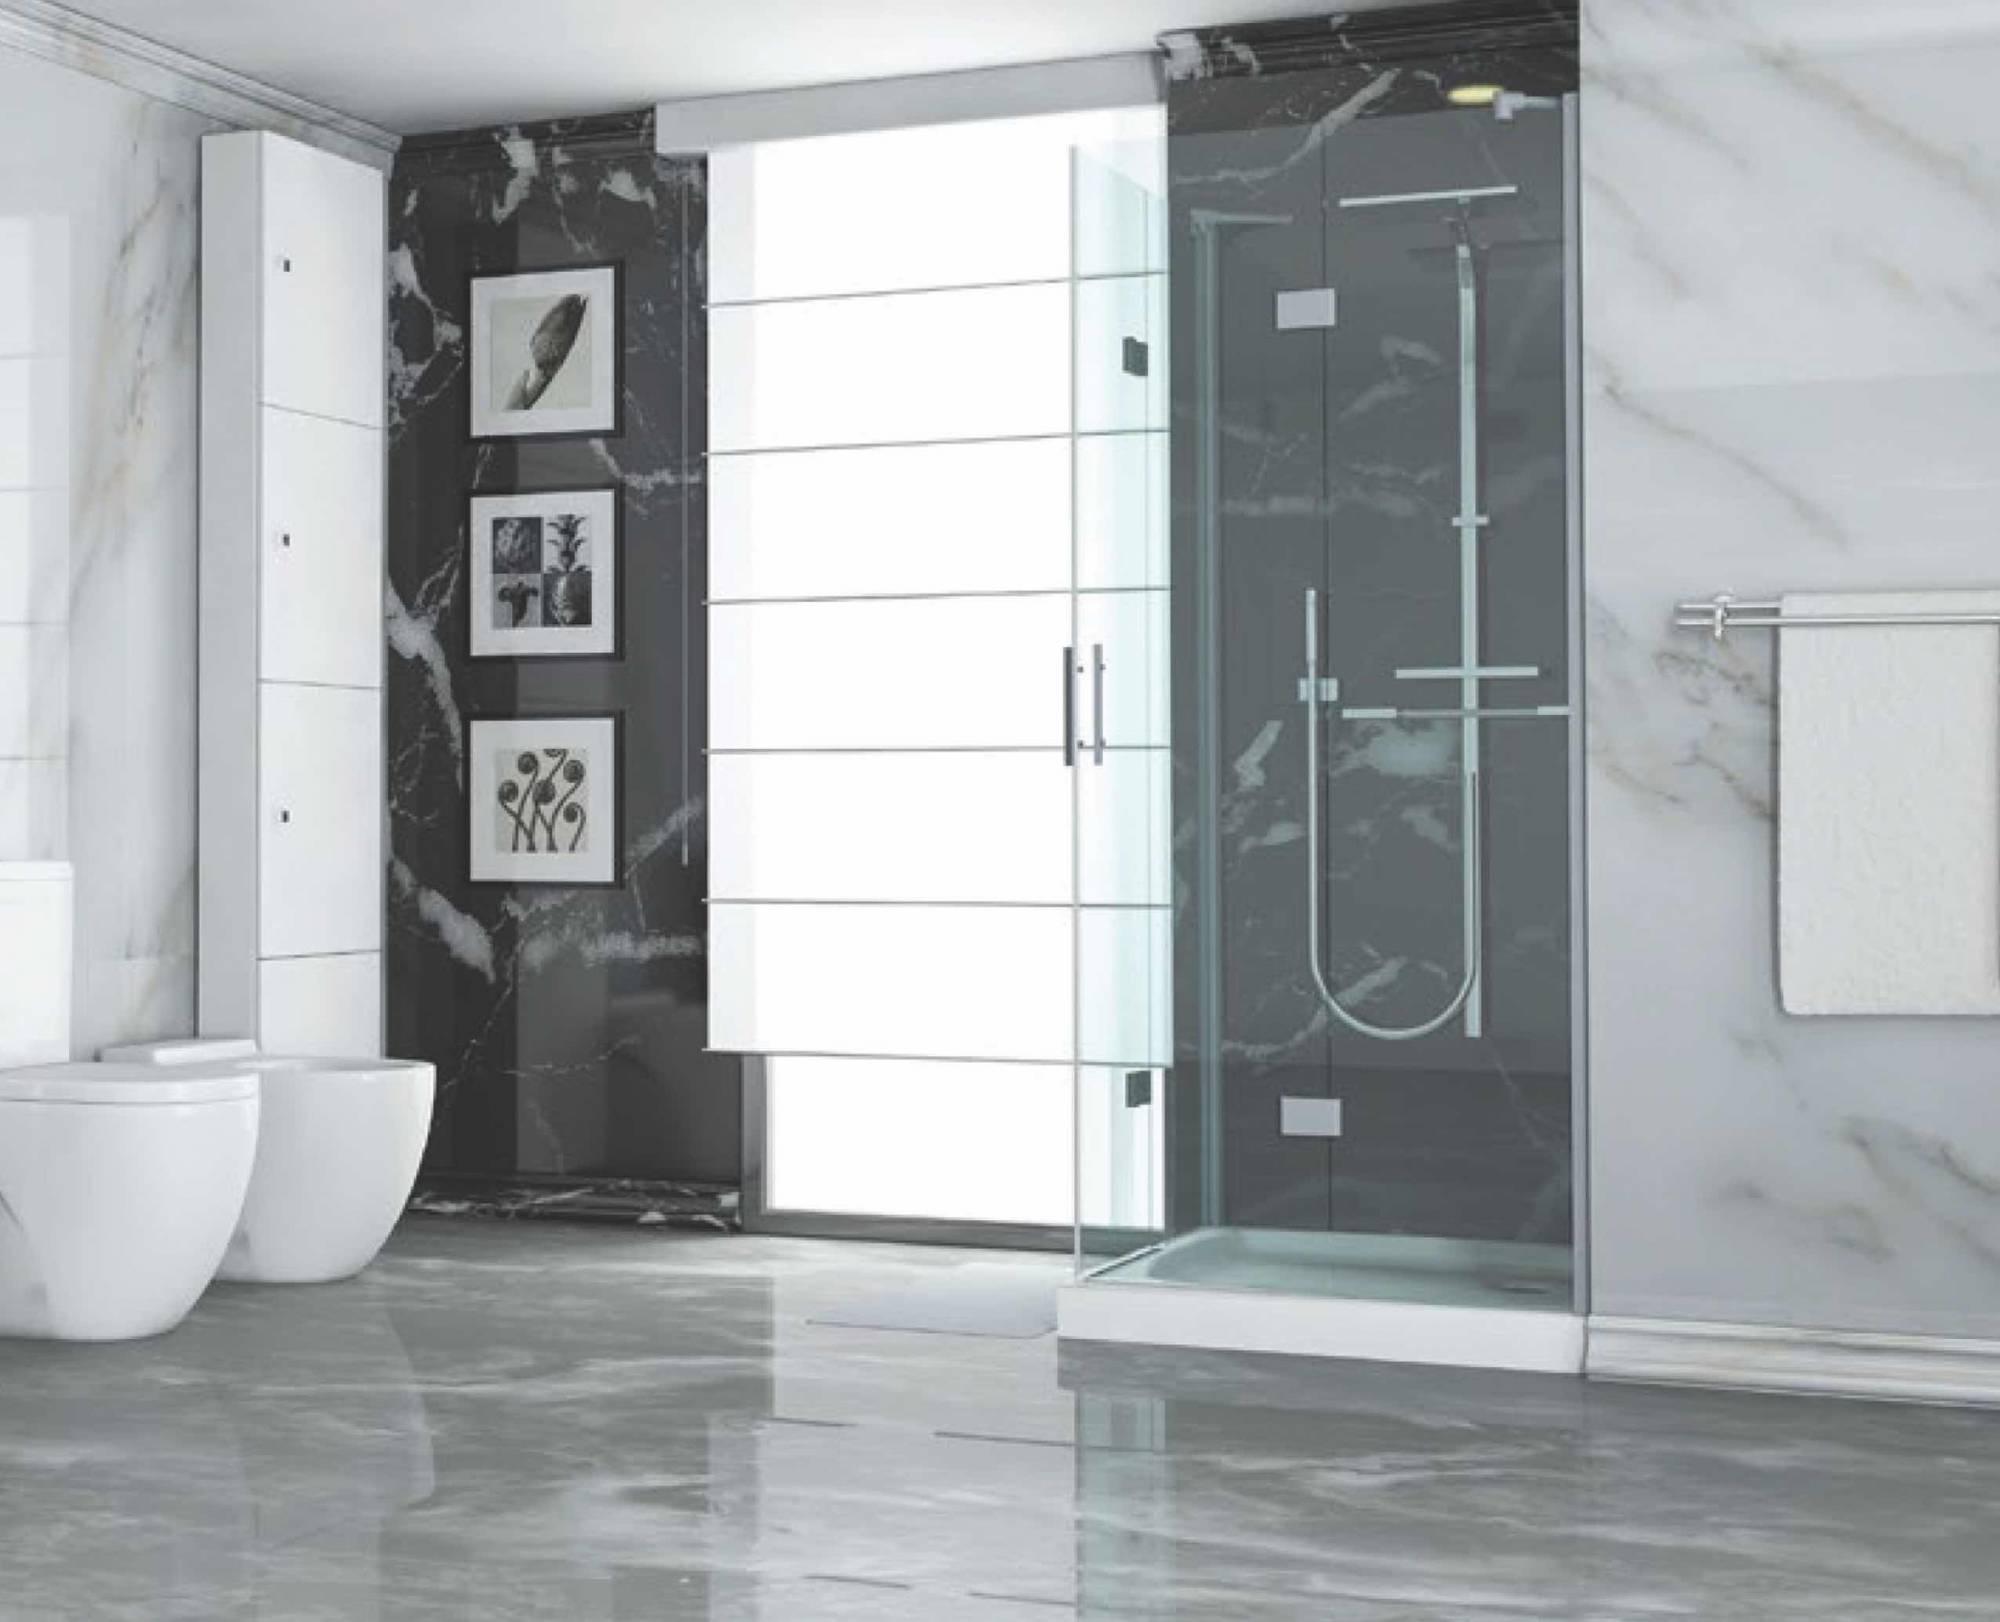 Fabricant de carrelage travertin pour salle de bain Bruxelles ...